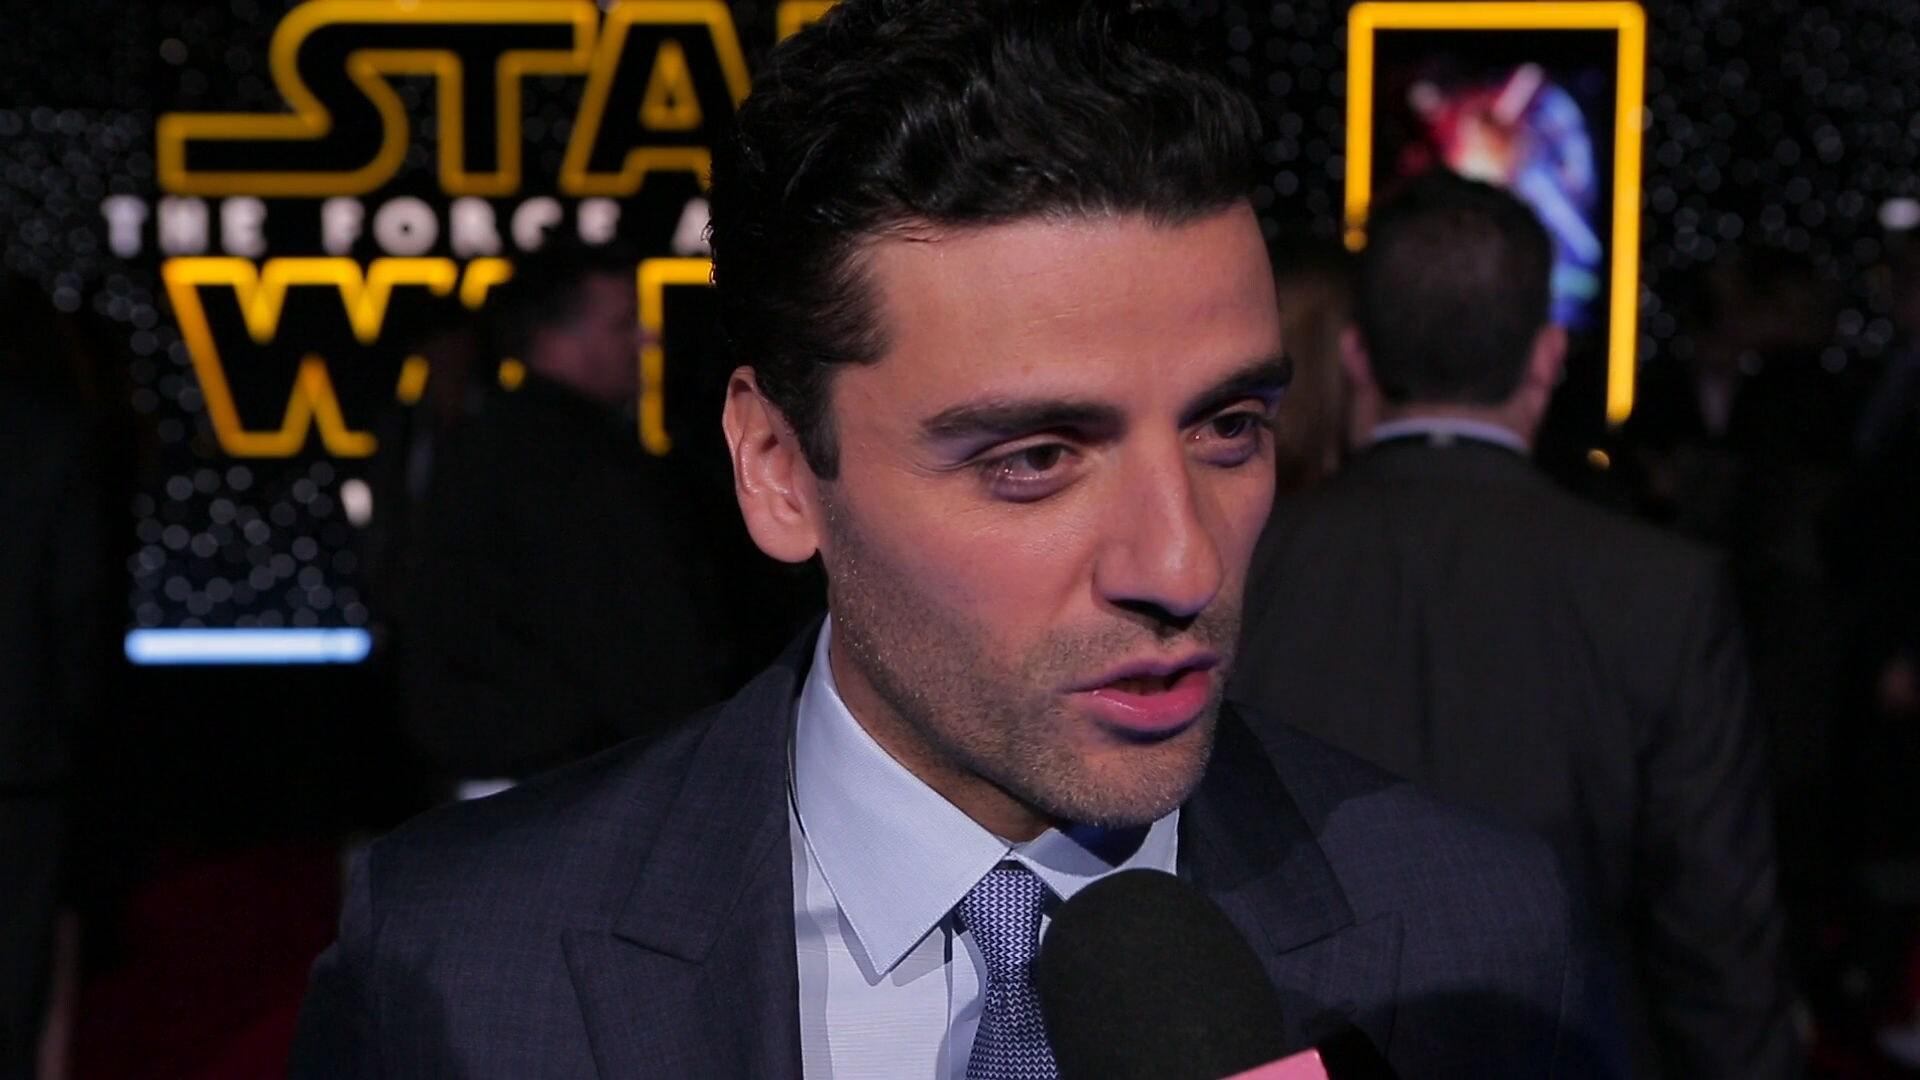 Star Wars: The Force Awakens - Light Side or Dark Side?